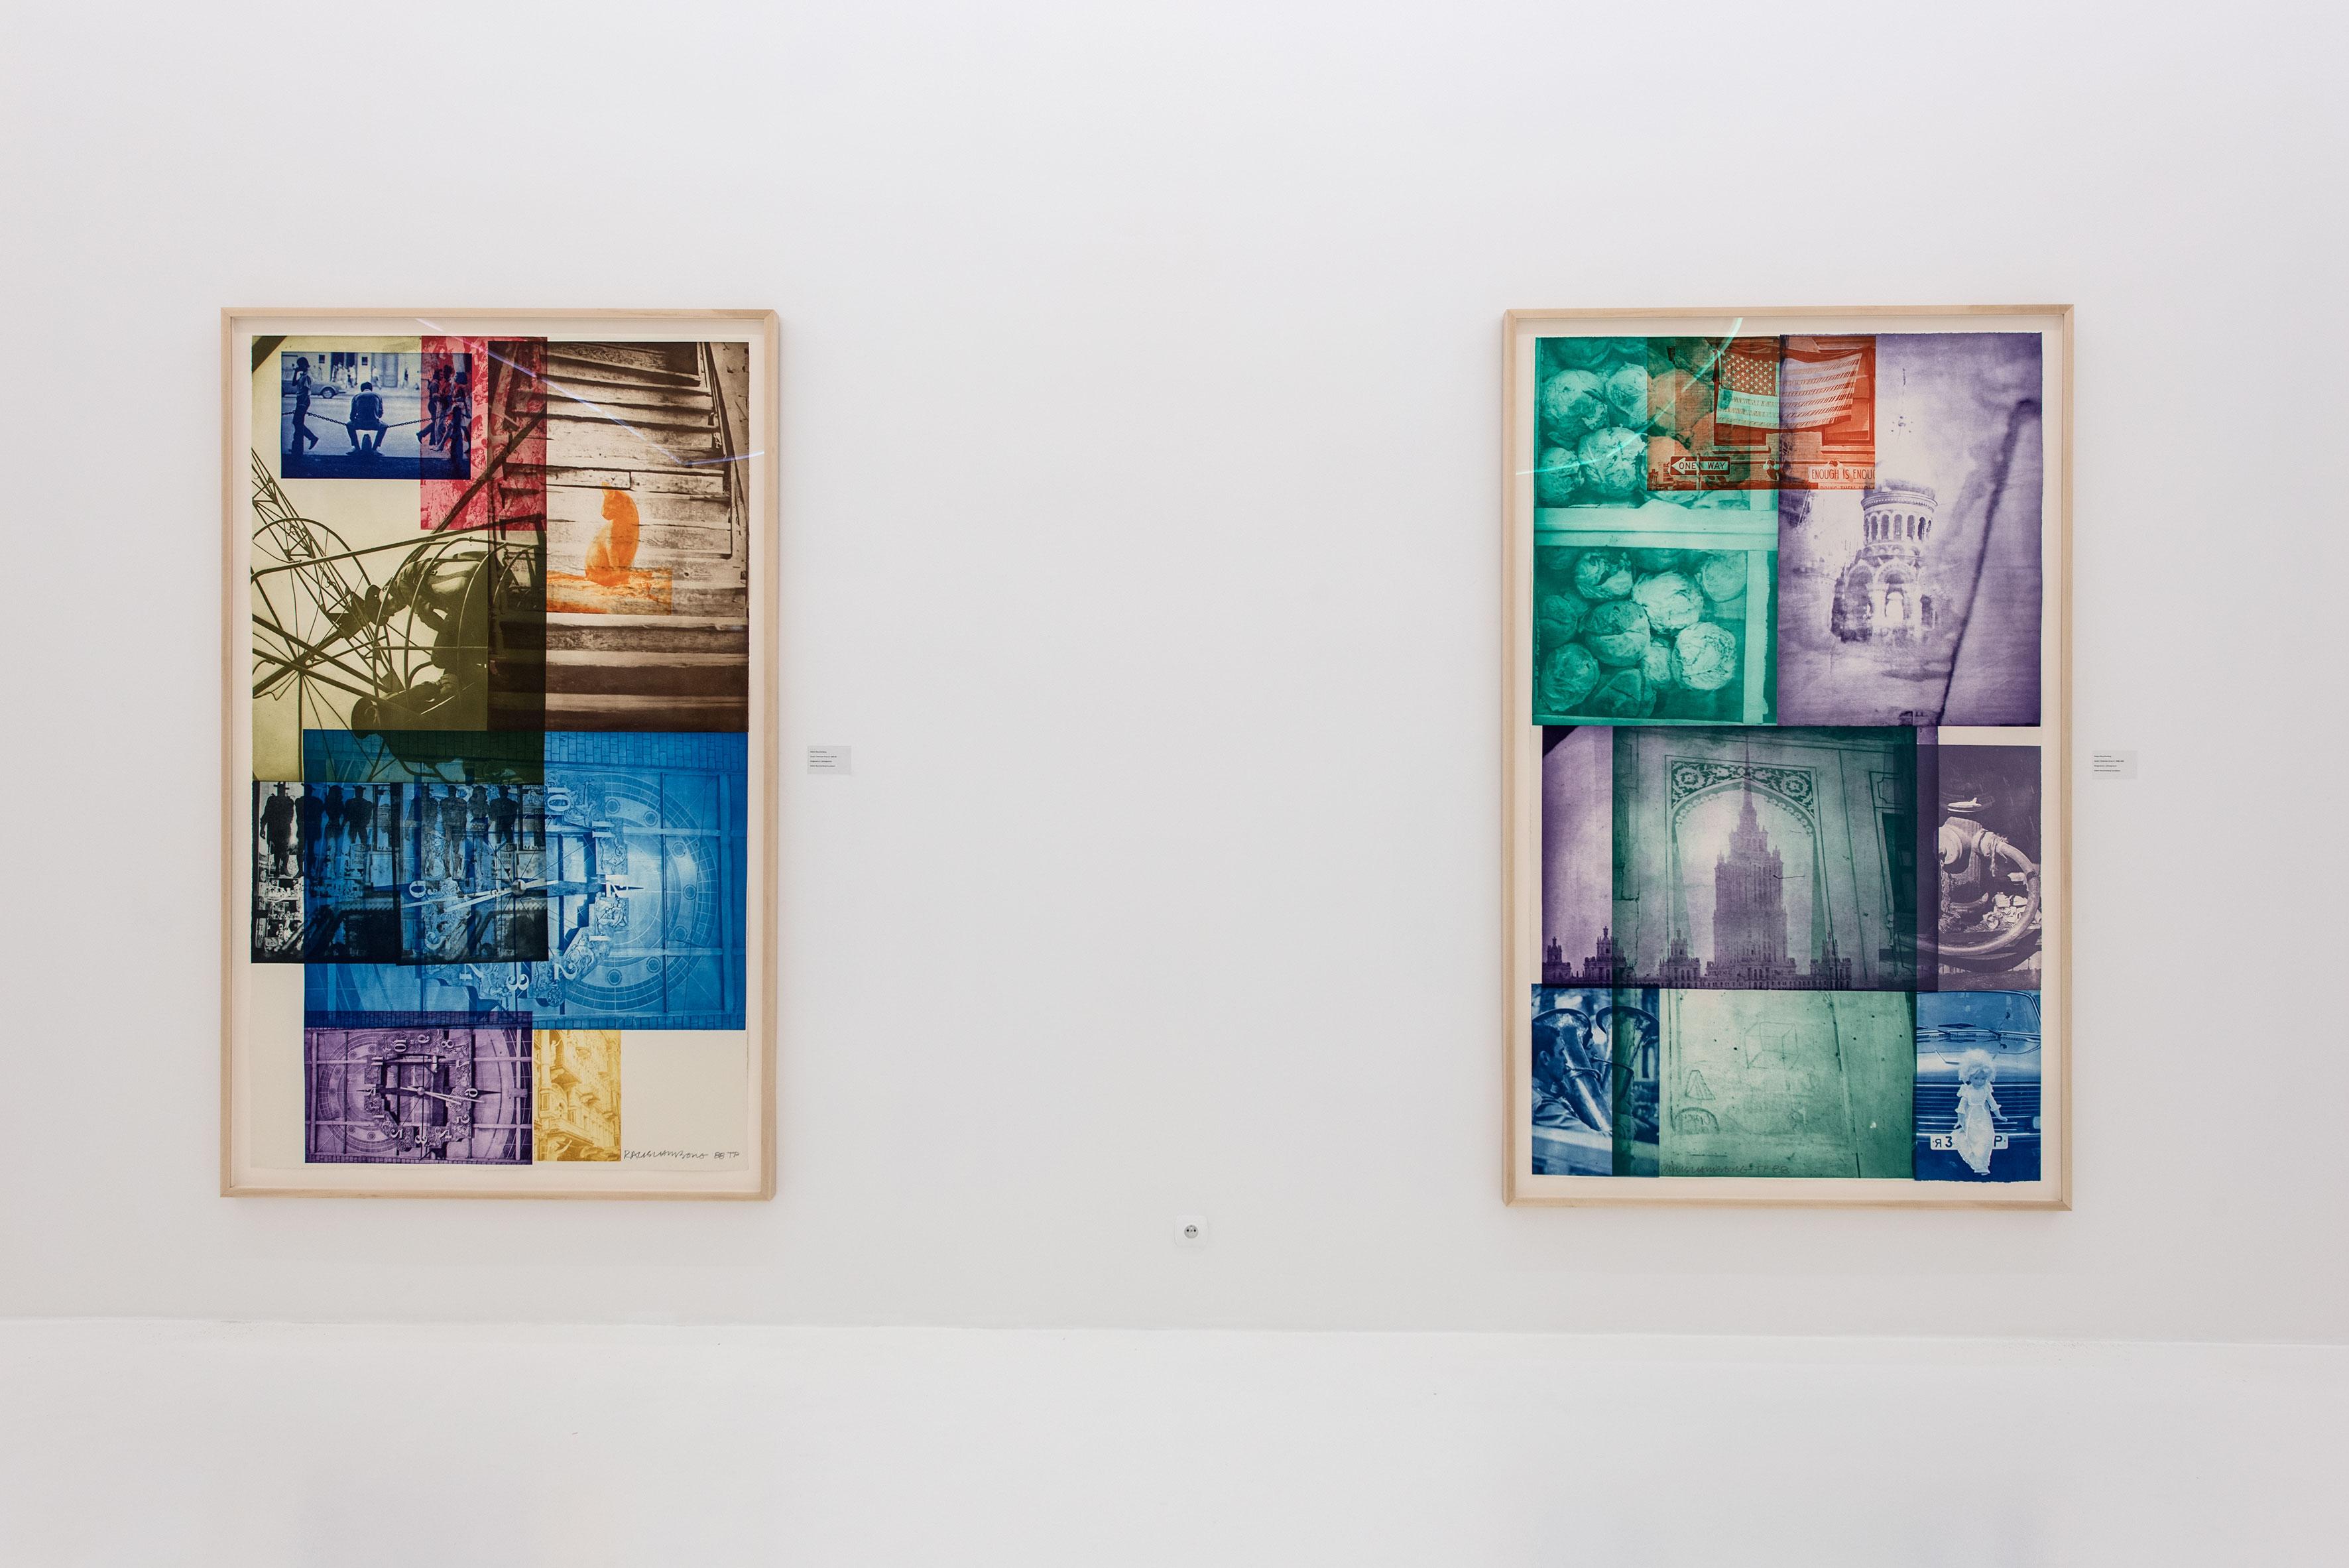 Robert Rauschenberg / Robert Rauschenberg Travels, widok wystawy, Atlas Sztuki wŁodzi